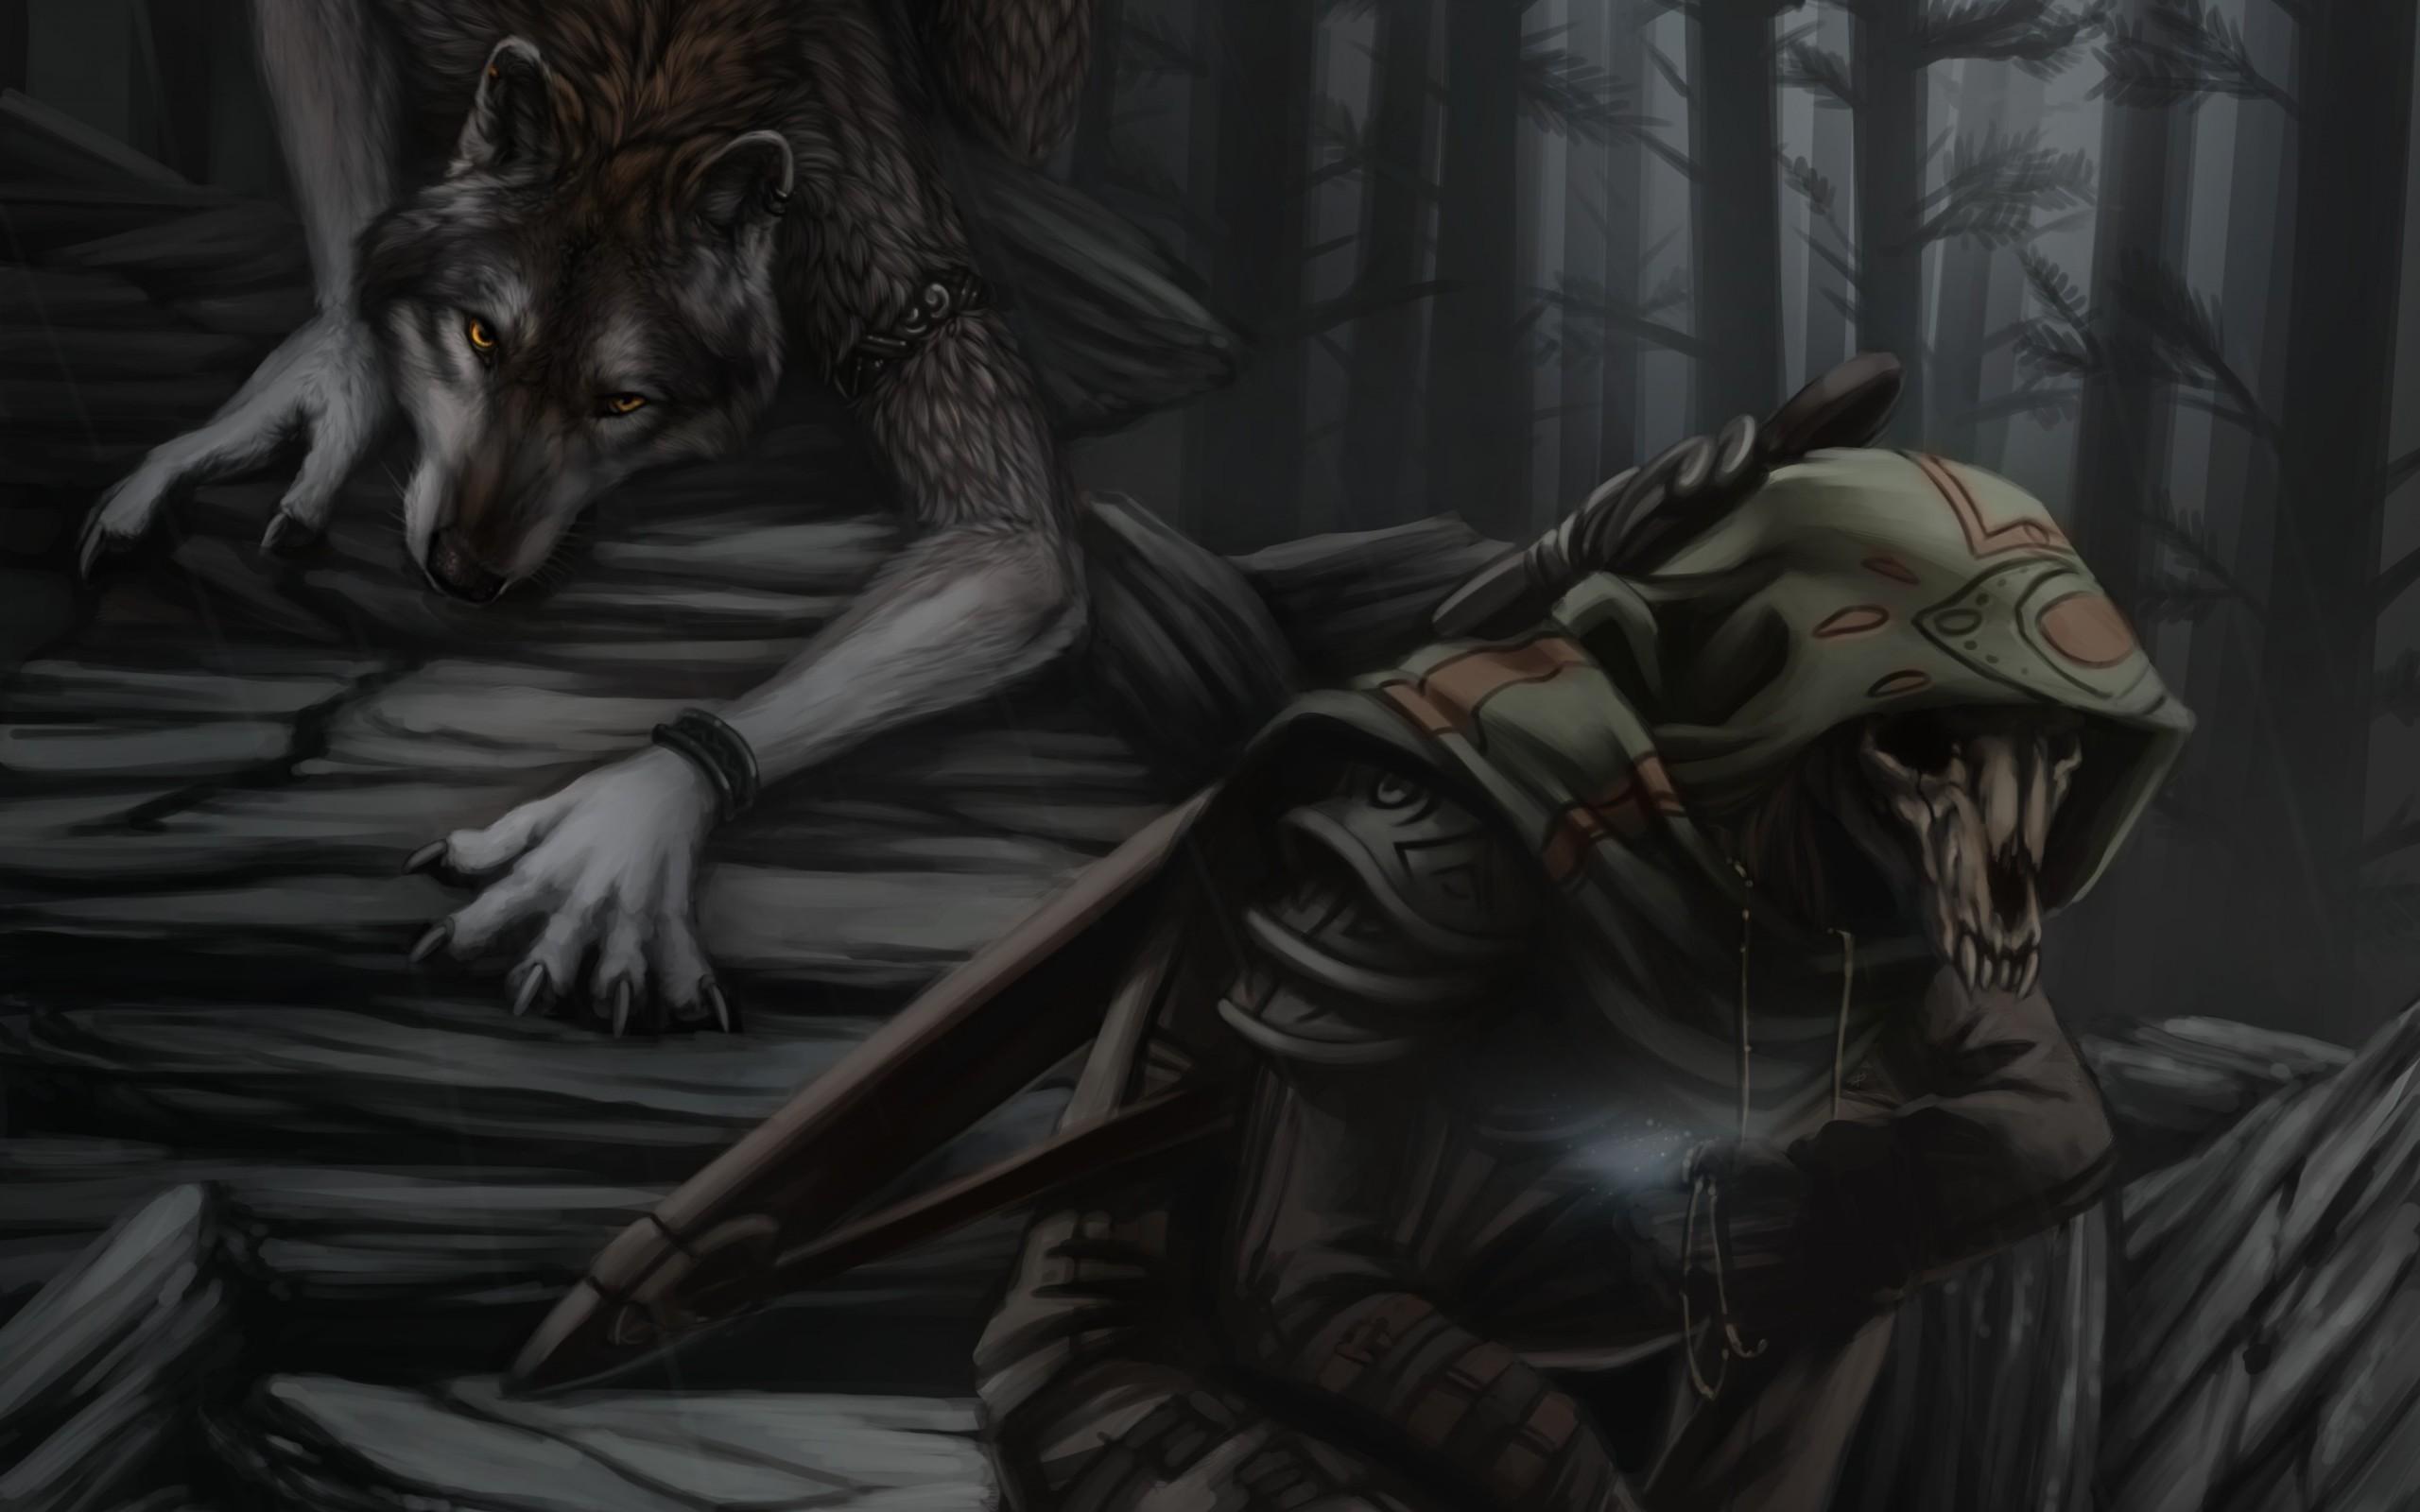 … Werewolf and Grim Reaper